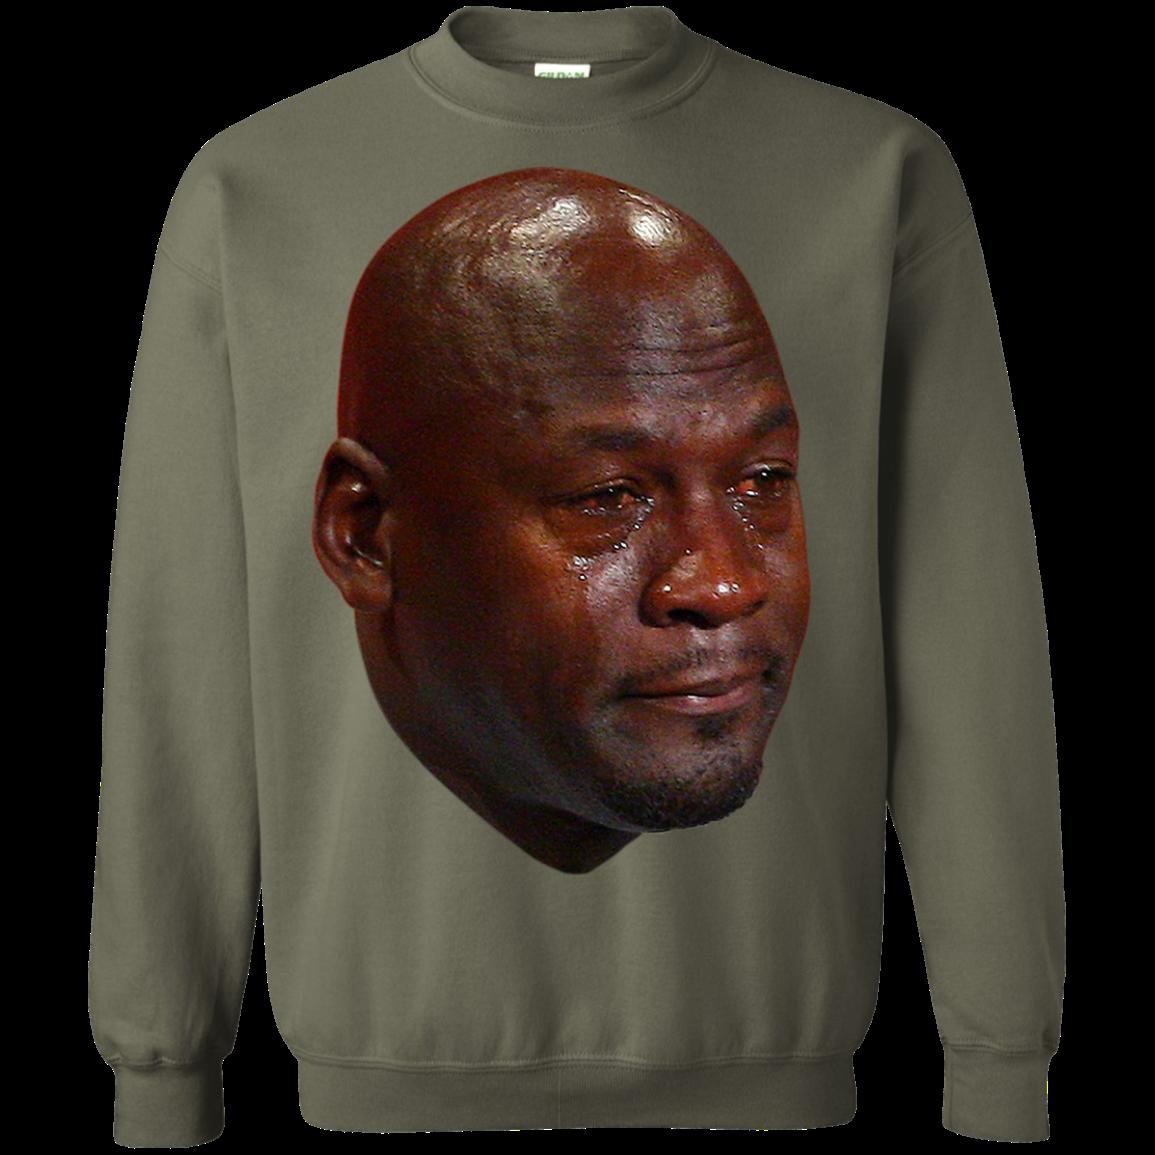 Crying Jordan Sweatshirt Jordan sweatshirt, Sweatshirts